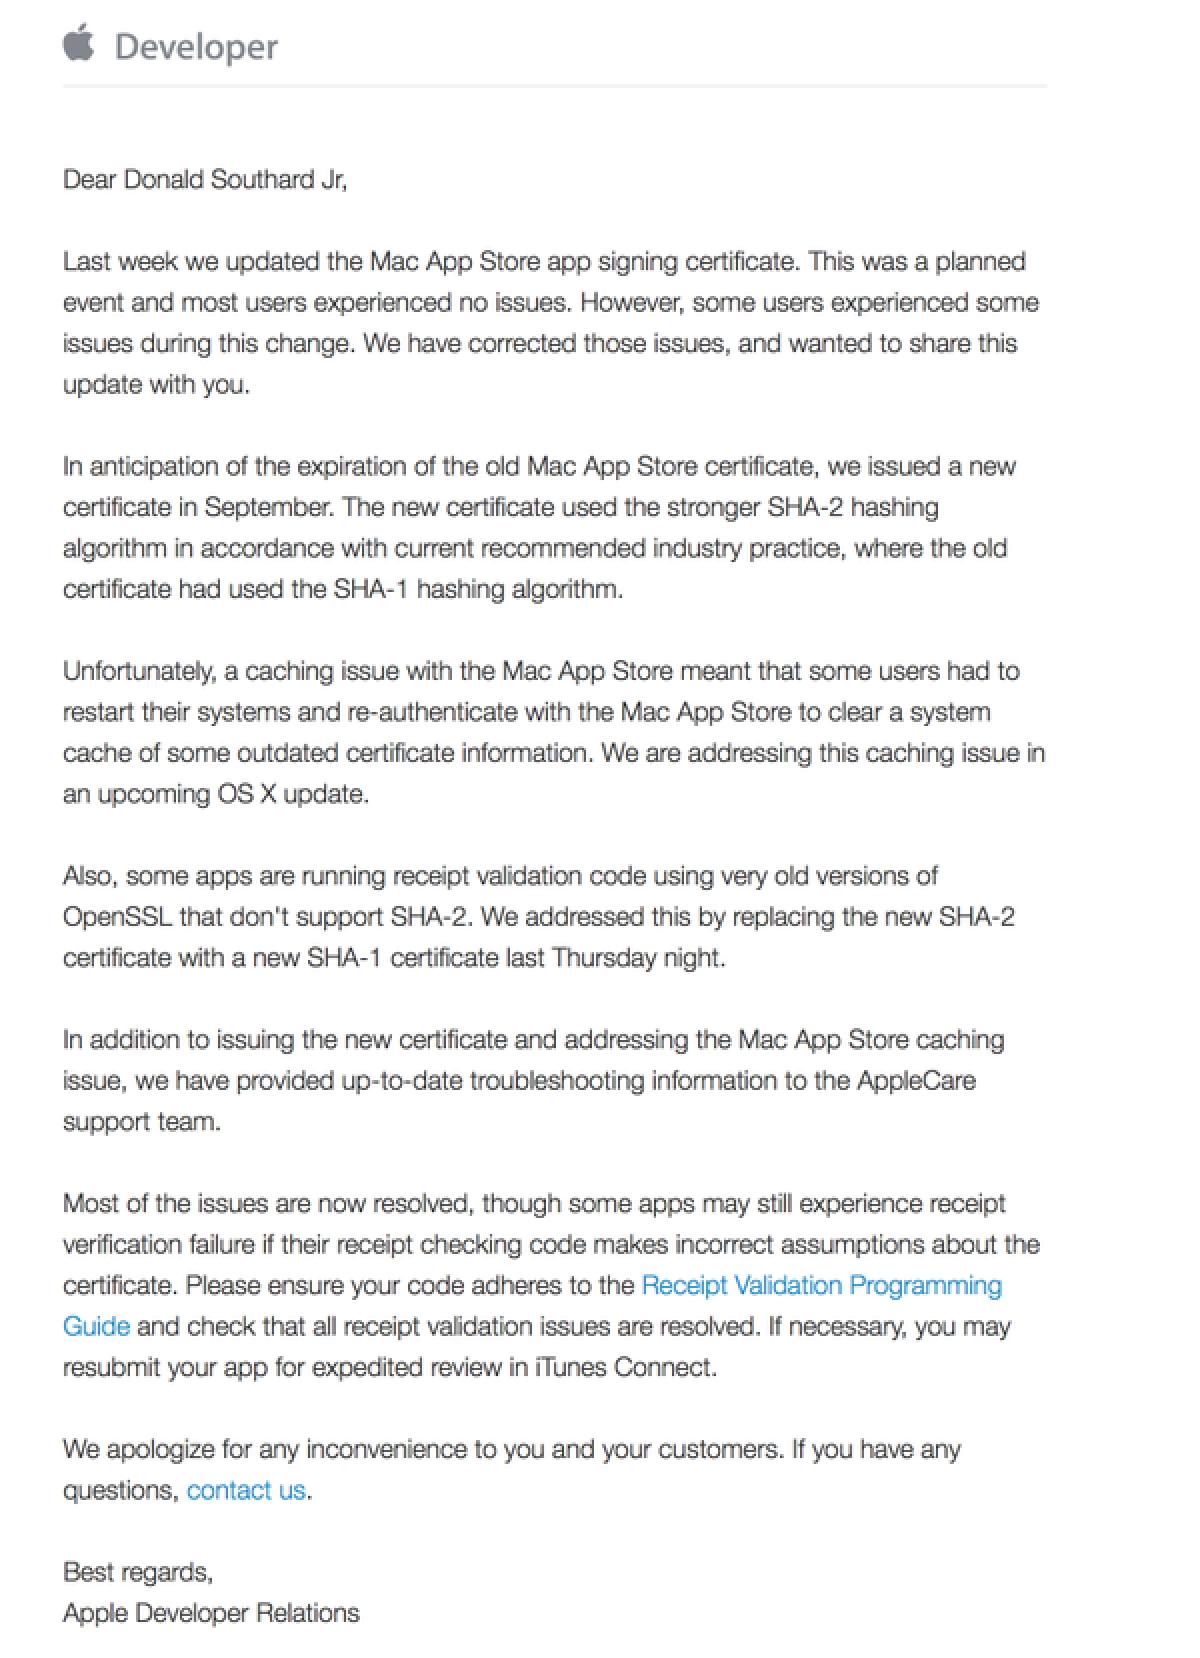 Apple Responds to Developers Regarding Expired Mac App Store